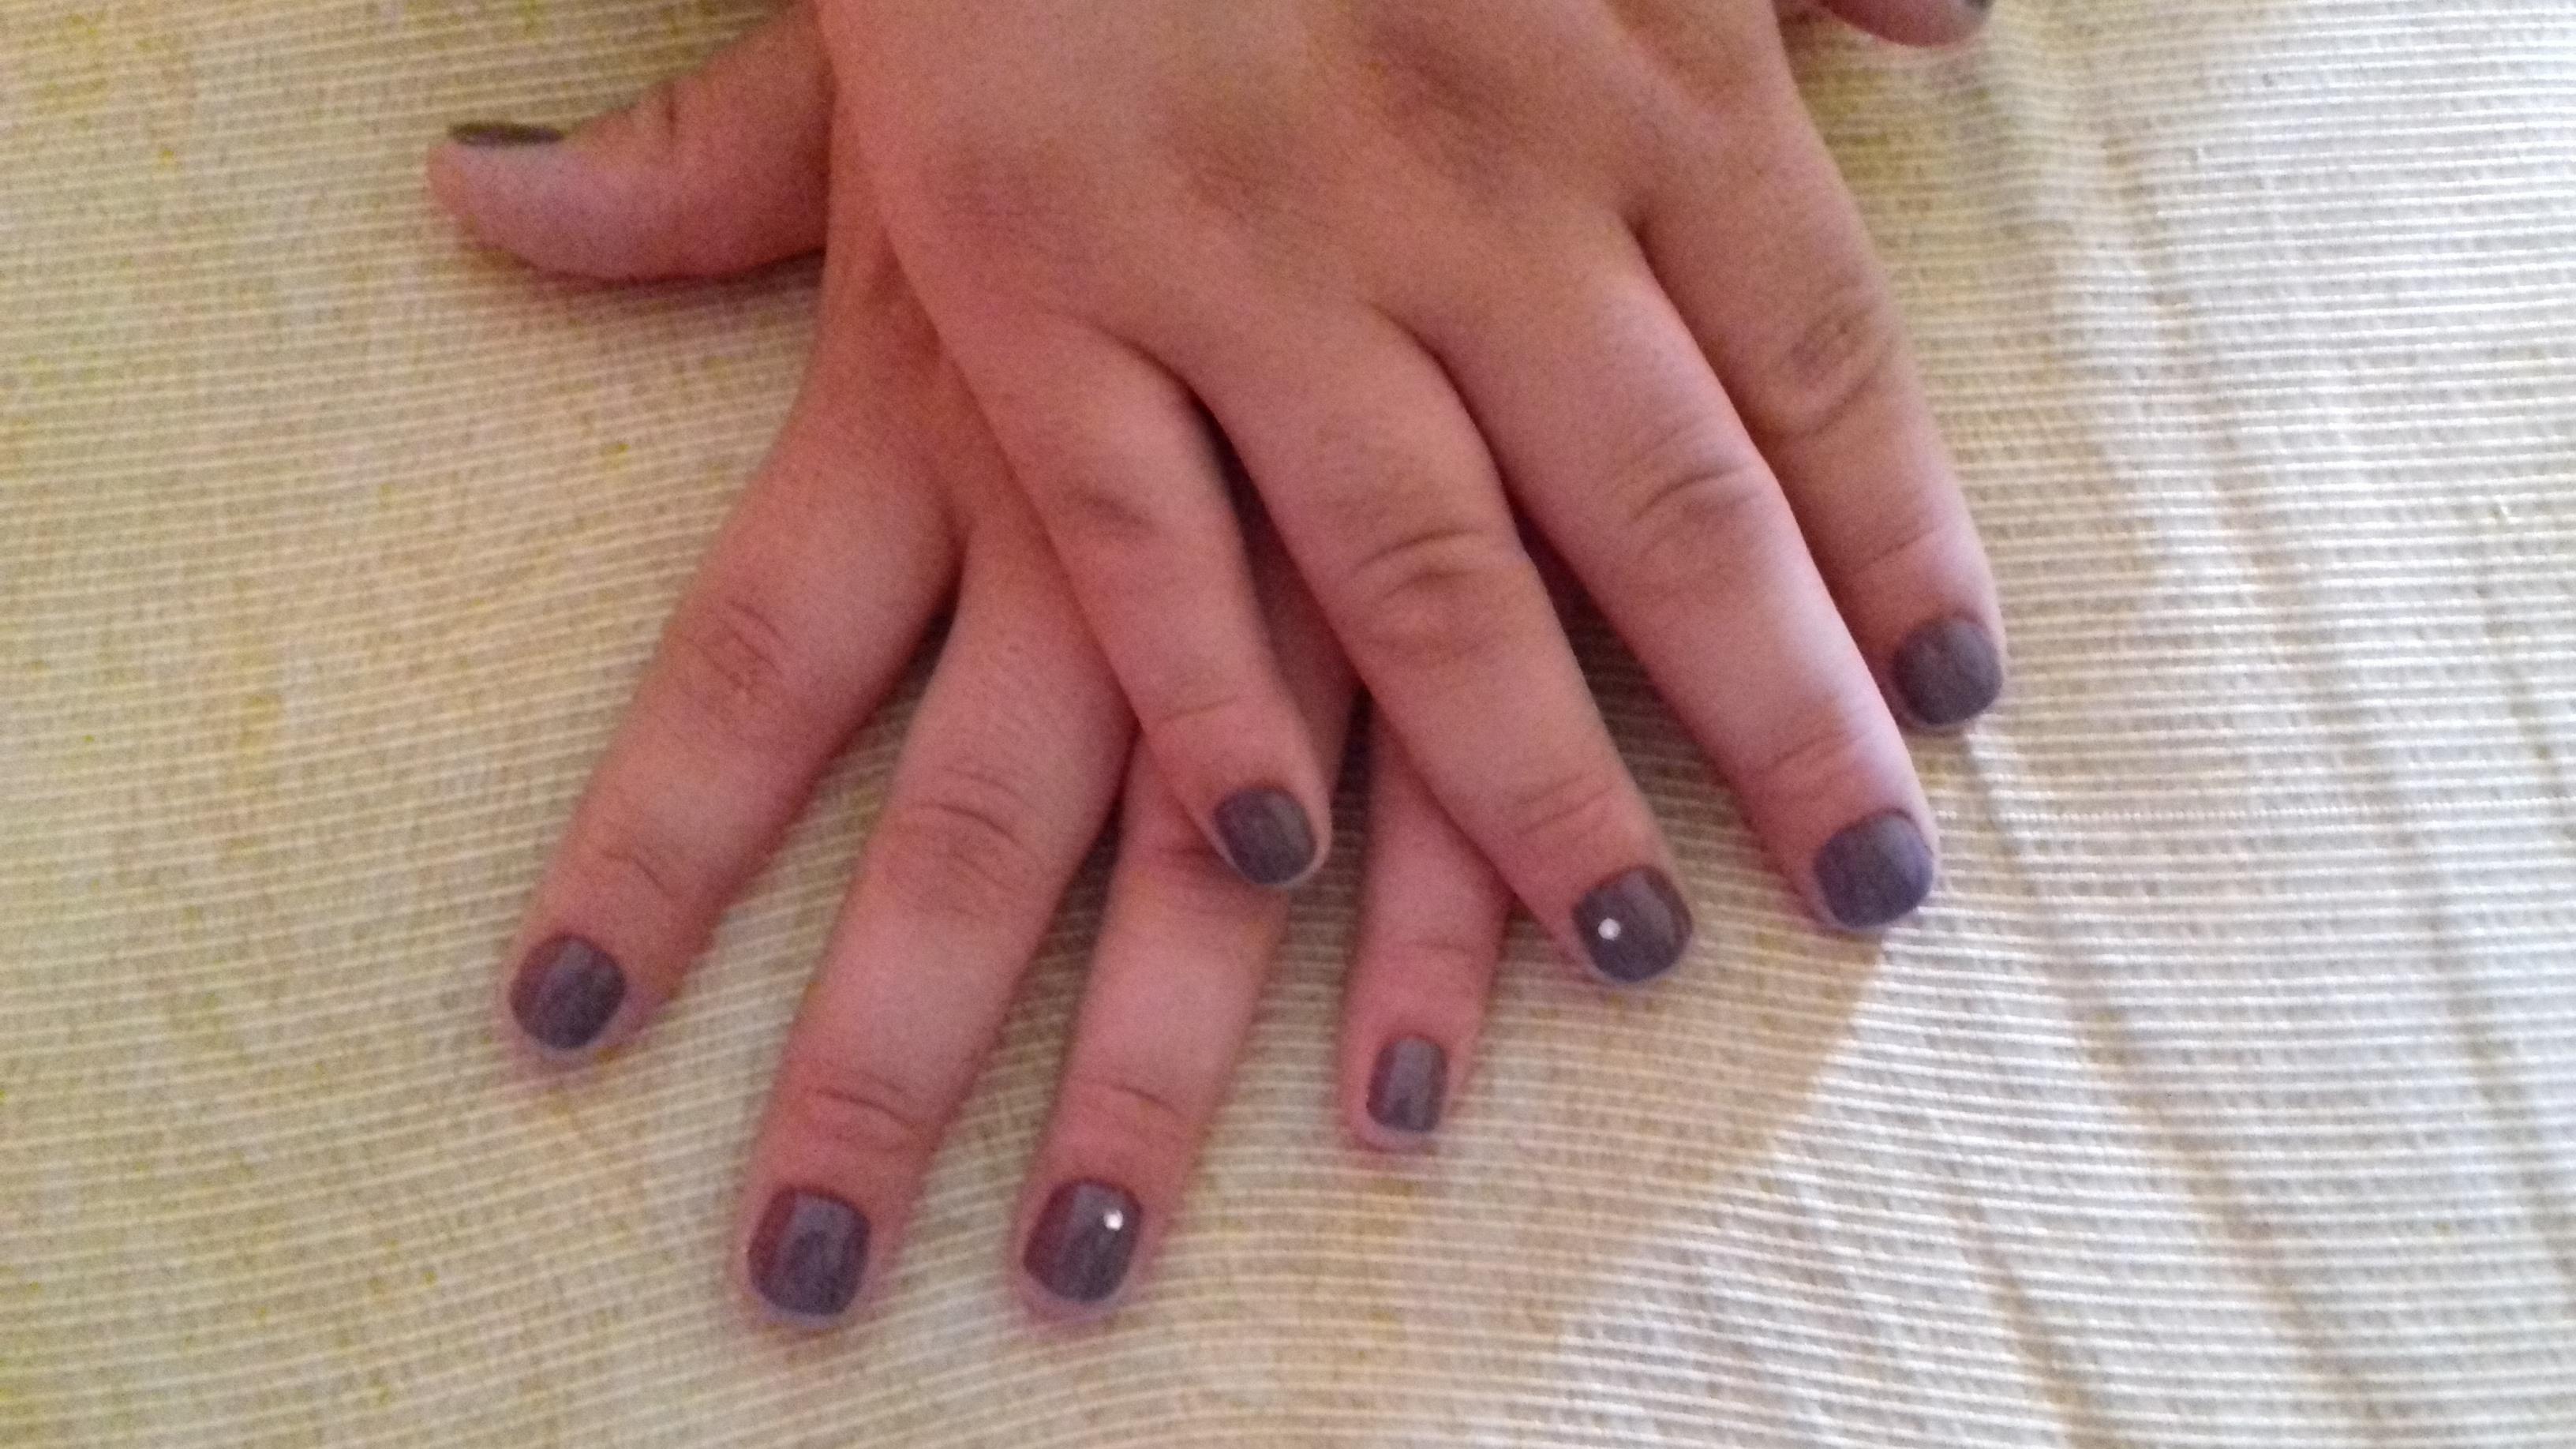 #feliznoquetrabalhoamomuitoooo unha manicure e pedicure